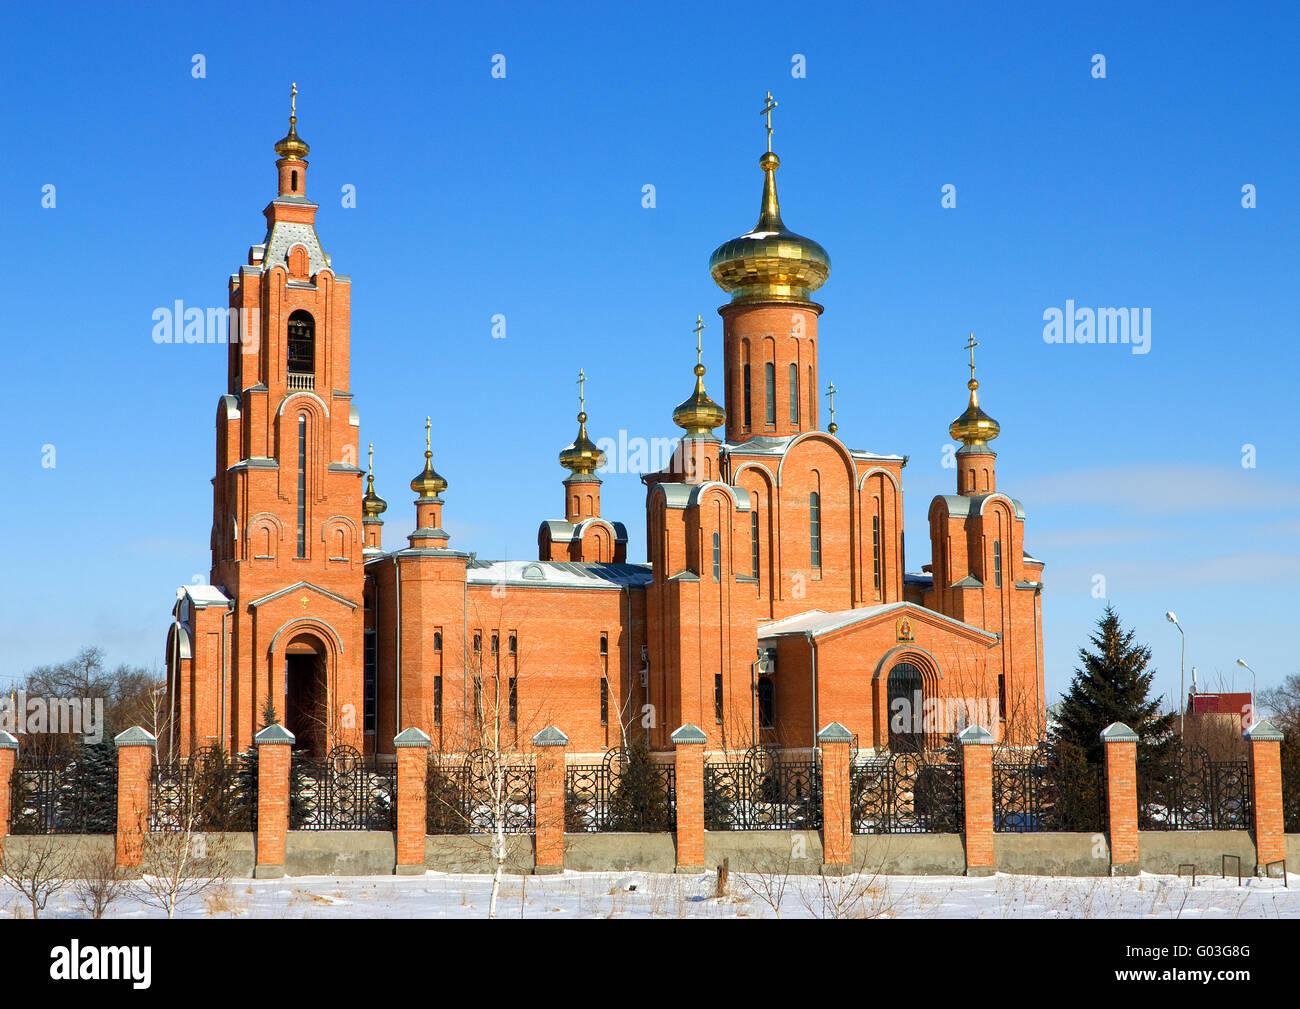 Russian church - Stock Image